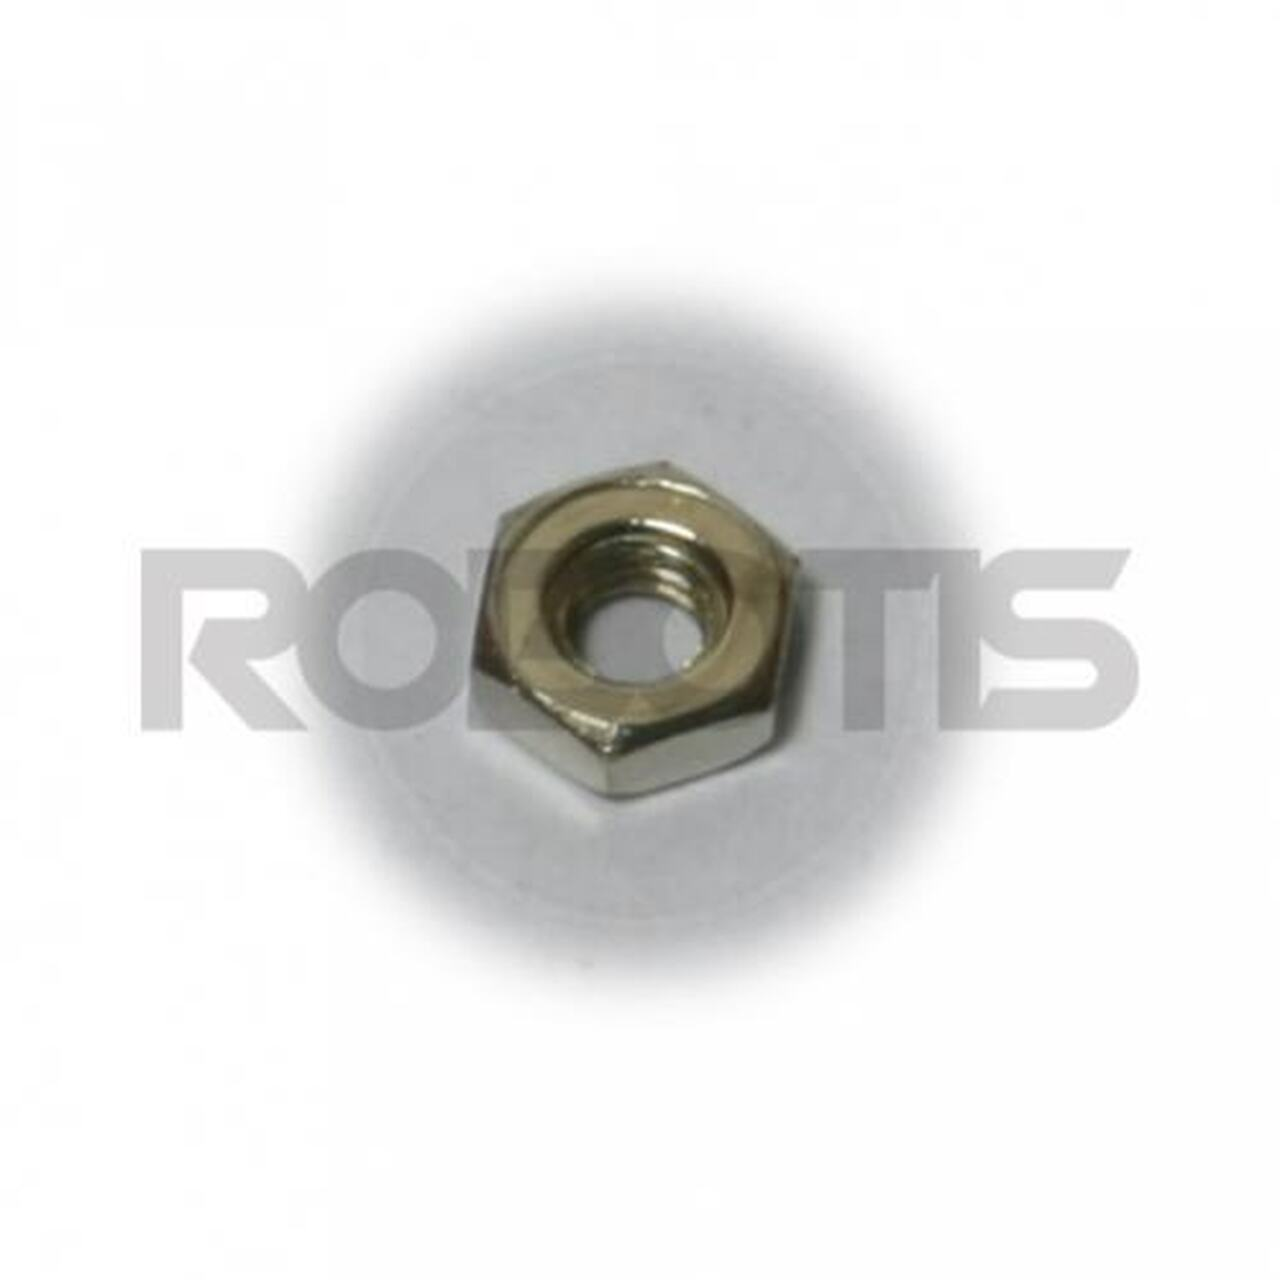 Nut M2.6 (400pcs)